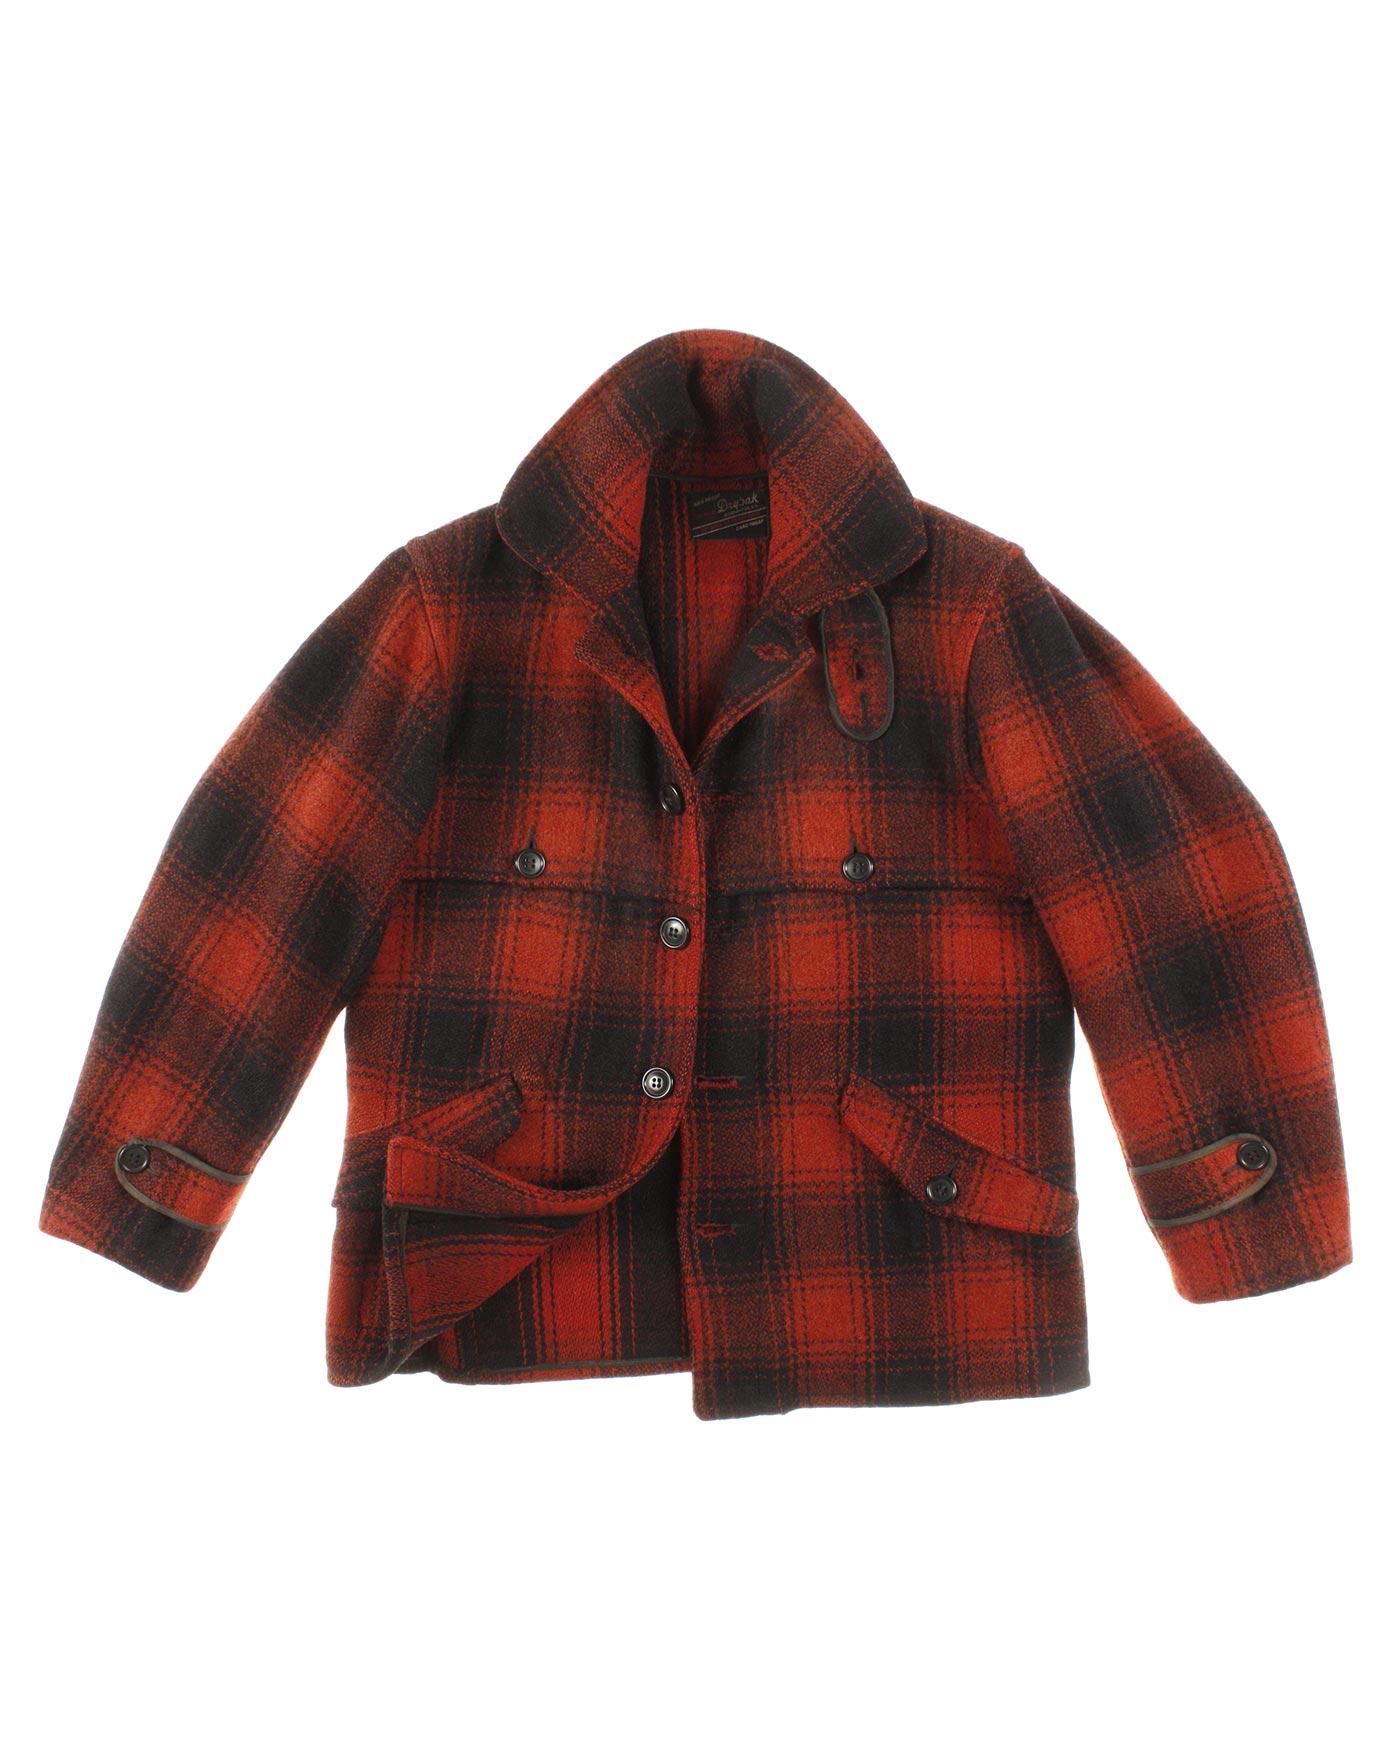 DRYBAKl wool coat 50s